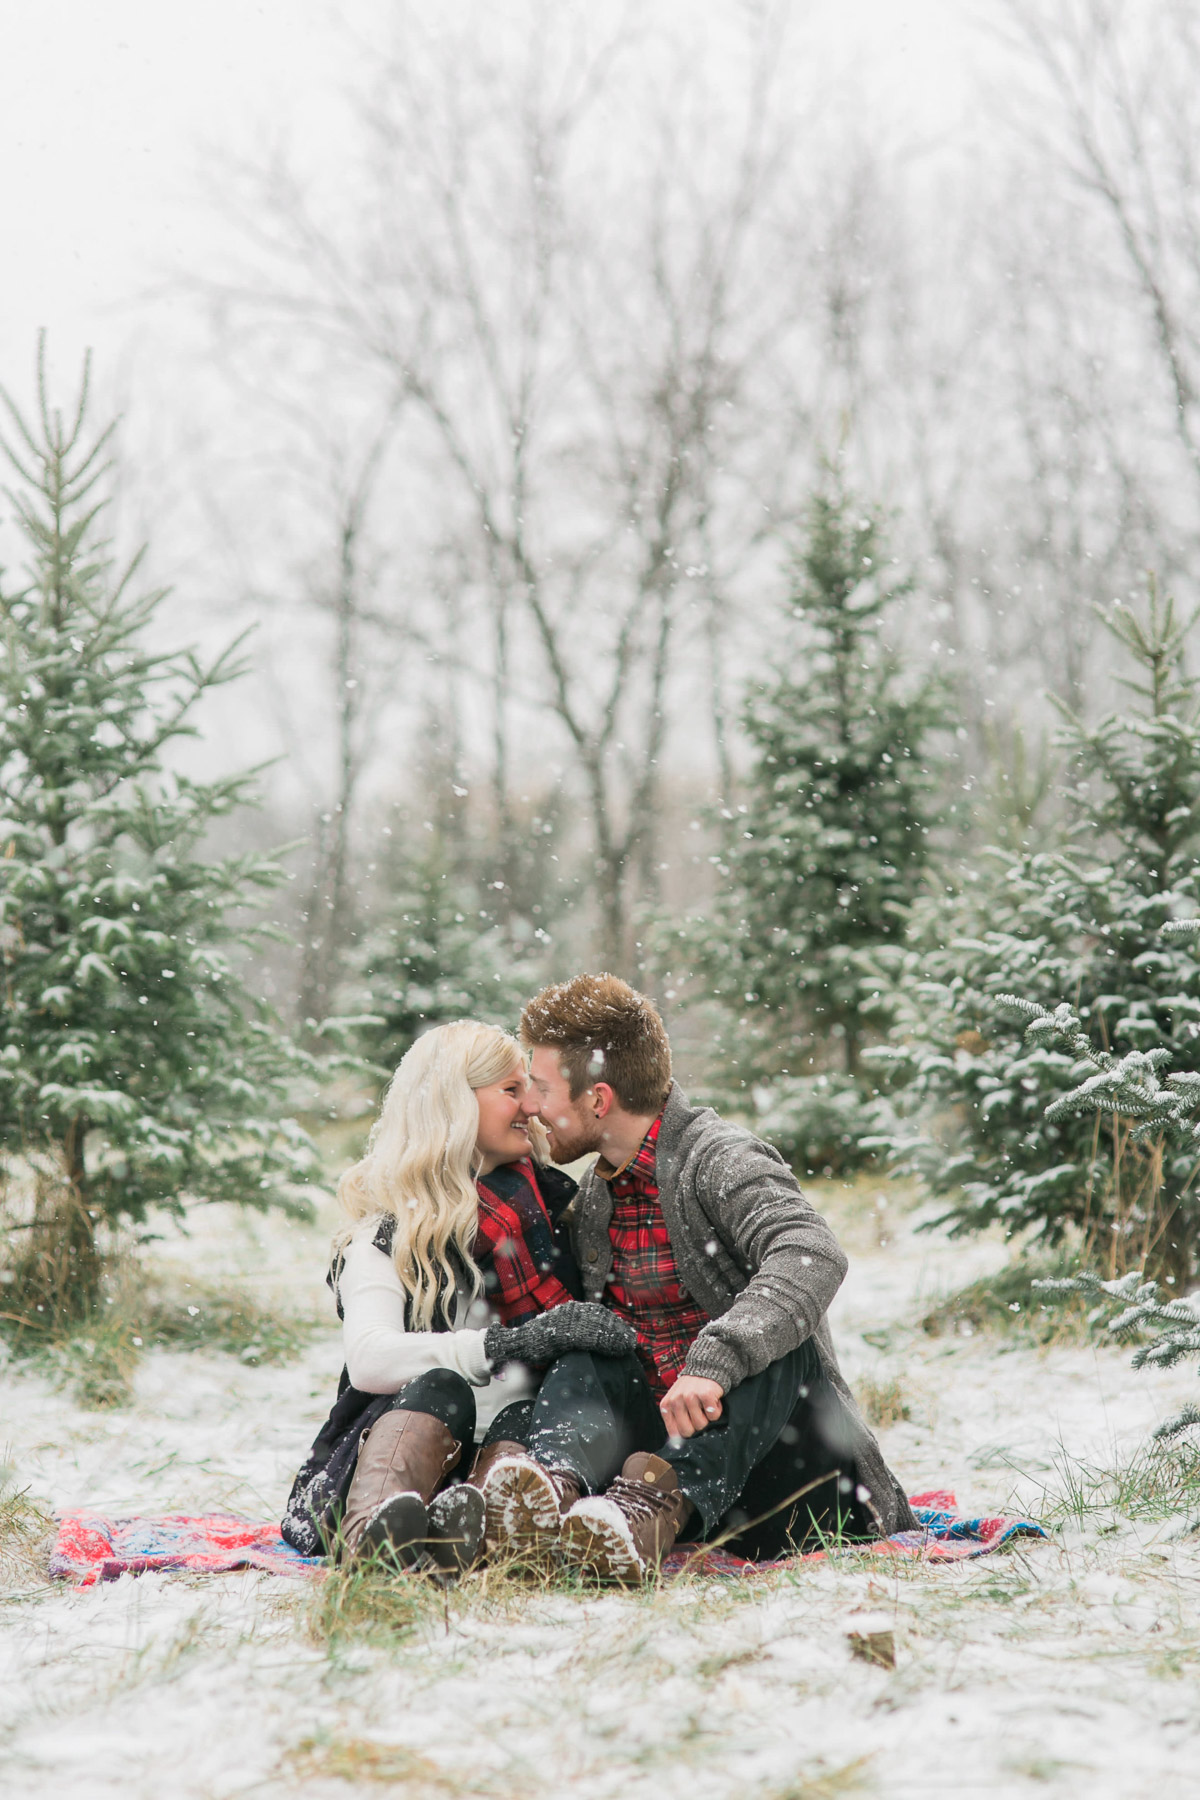 daniel-ricci-photography-vineyard-bride-swish-list-smiths-trees-ridgeville-engagement-4.jpg